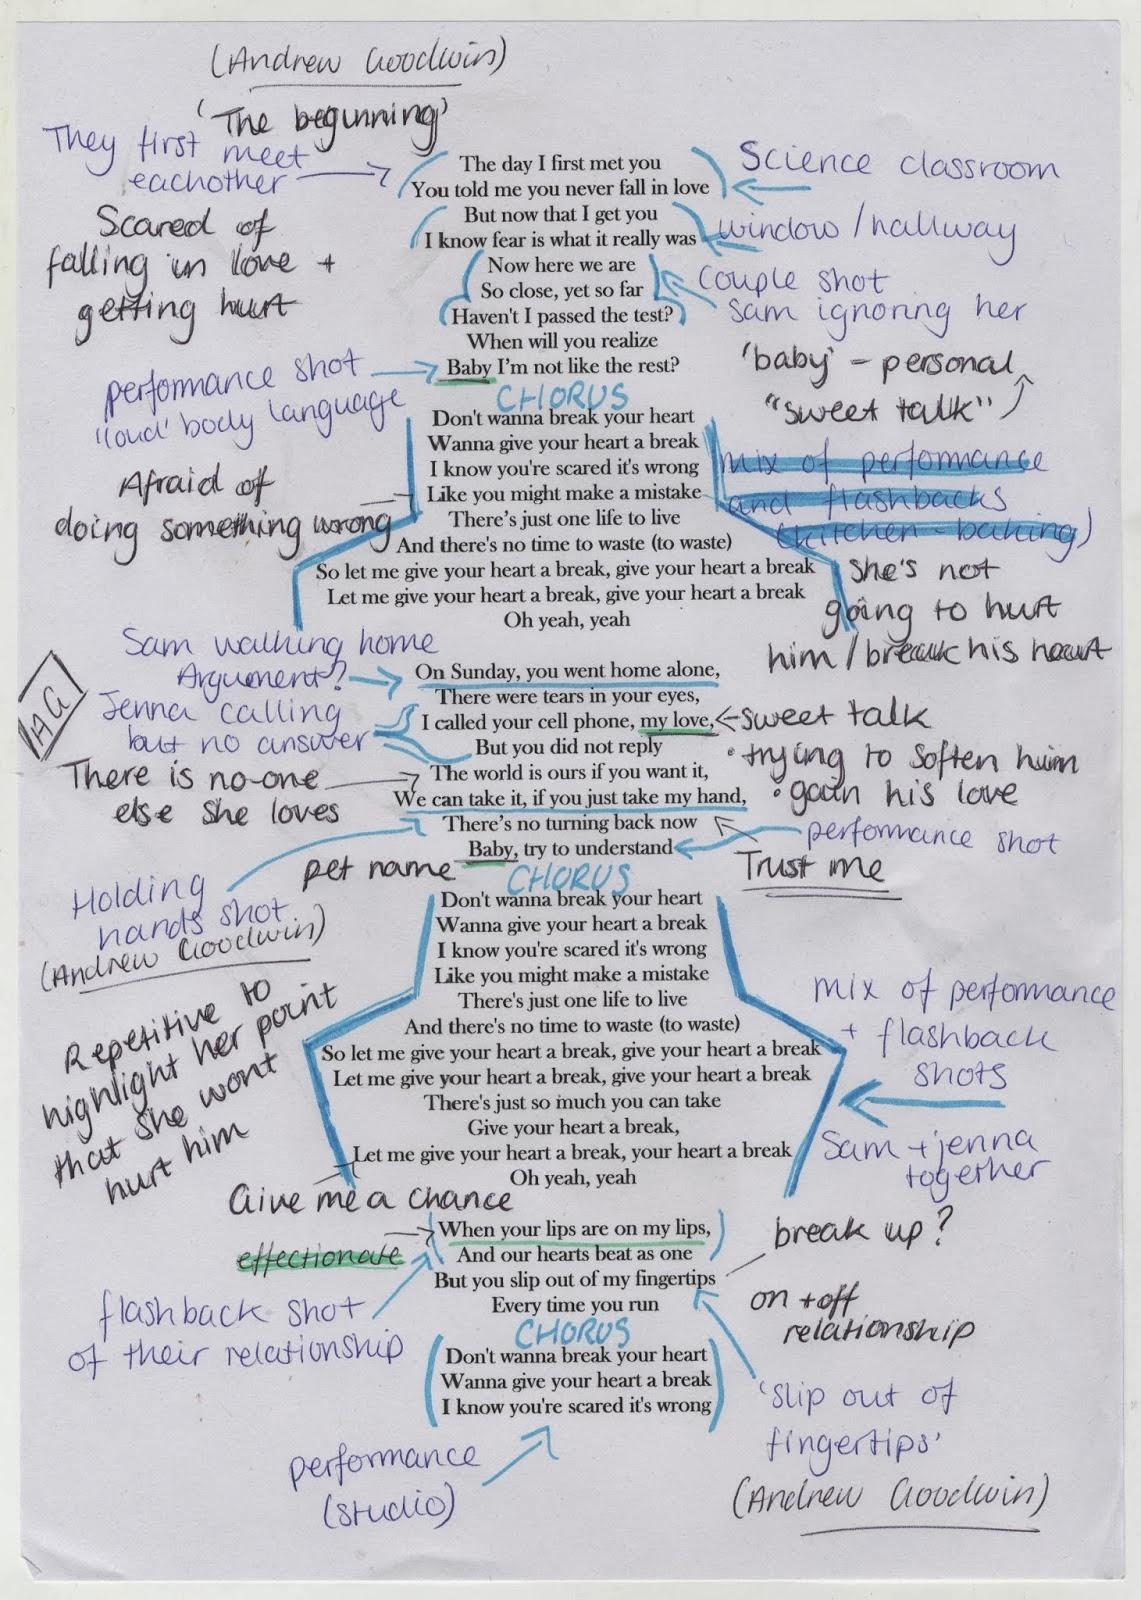 a2 hannah clorley media blog analysis of song lyrics task 13. Black Bedroom Furniture Sets. Home Design Ideas